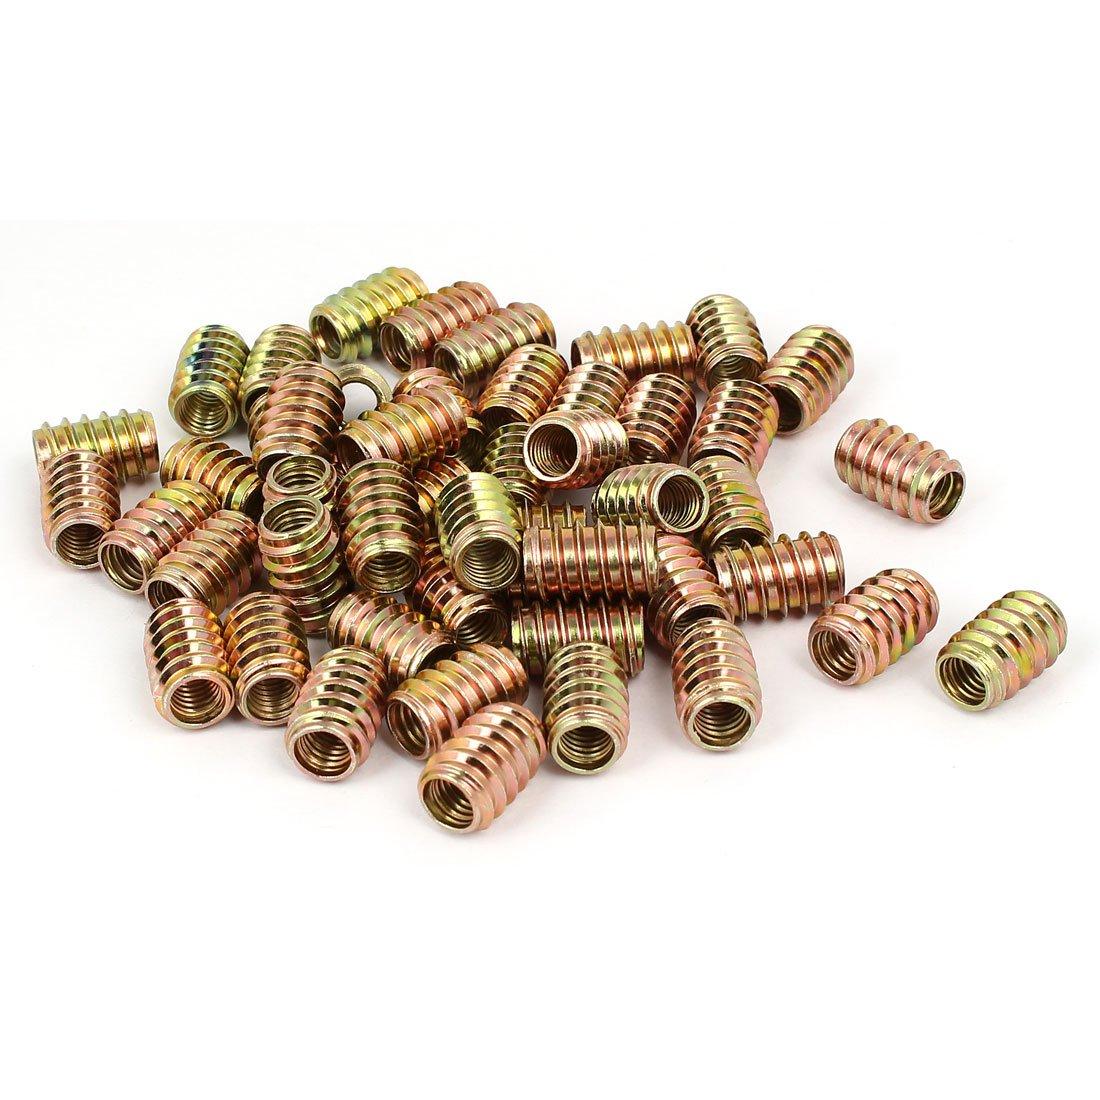 uxcell Wood Furniture M8 x 20mm Insert Fixing Screw E-Nut Bronze Tone 50pcs